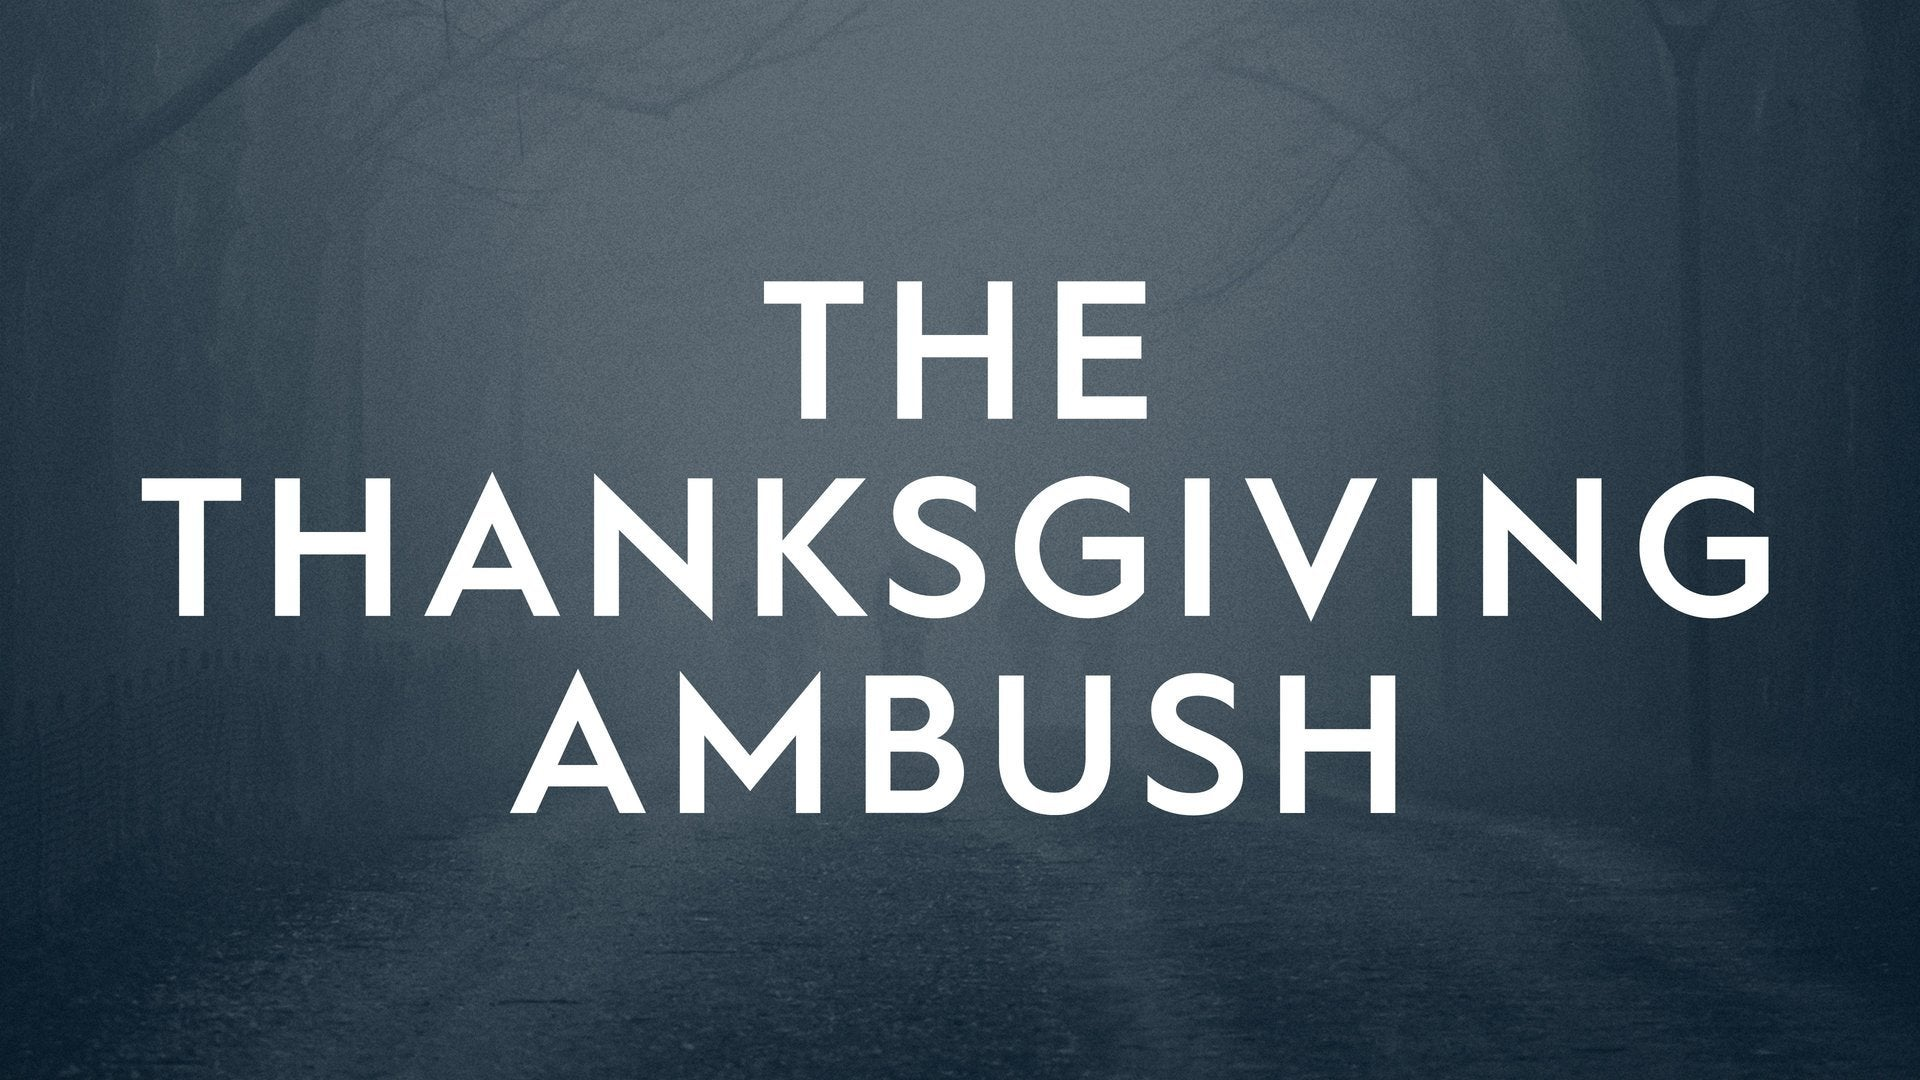 The Thanksgiving Ambush